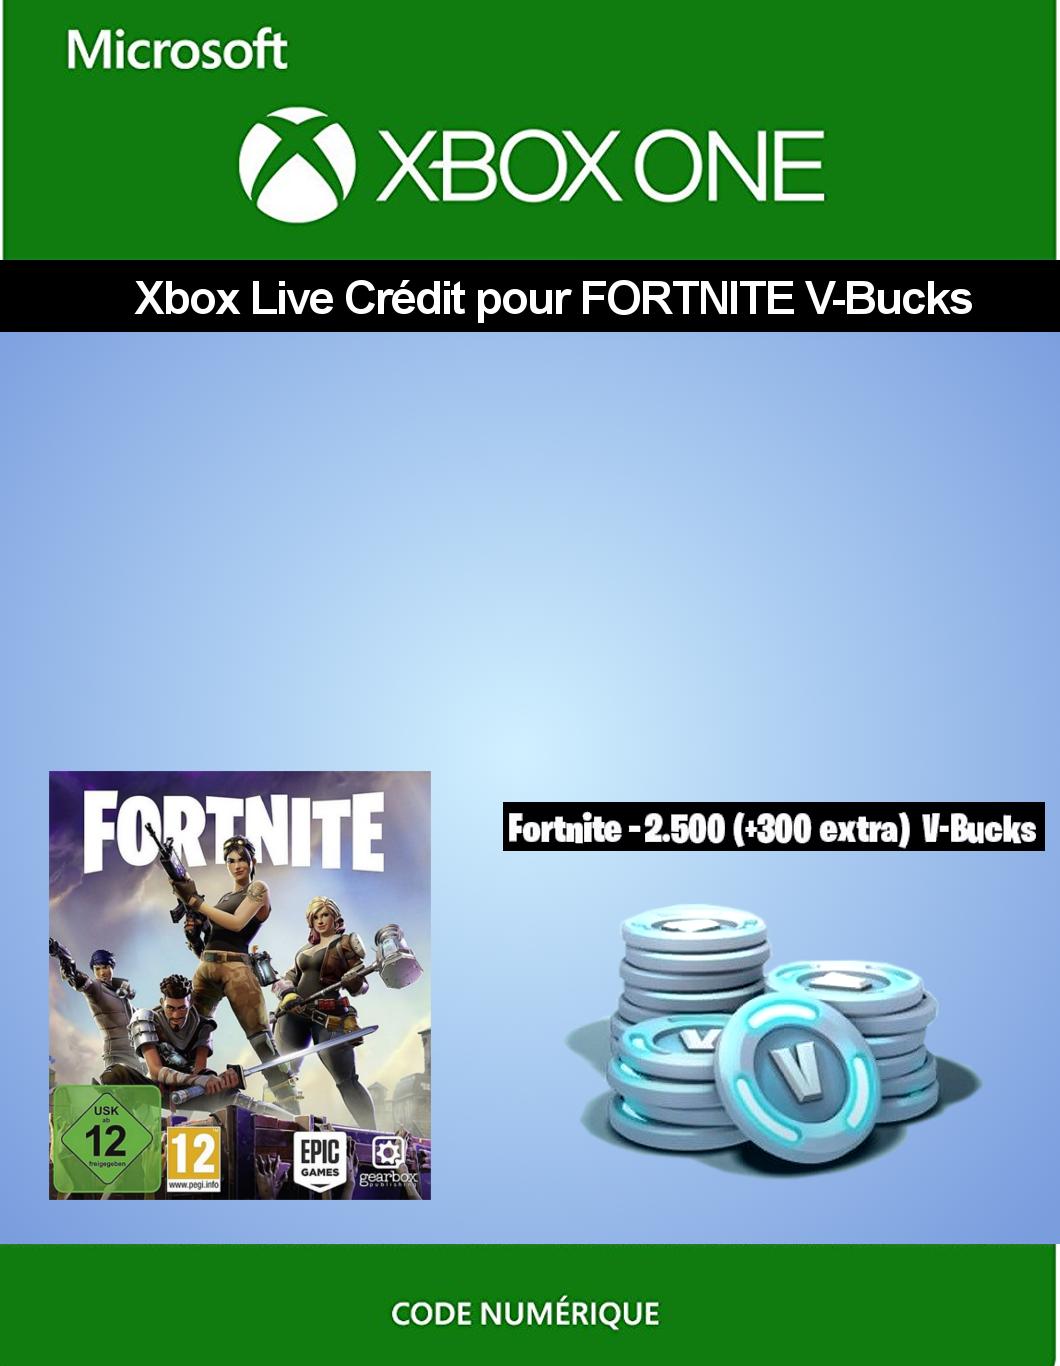 Xbox Live Guthaben für Fortnite - 2.500 V-Bucks + 300 extra V-Bucks   Xbox One - Download Code [PC Code - Kein DRM]